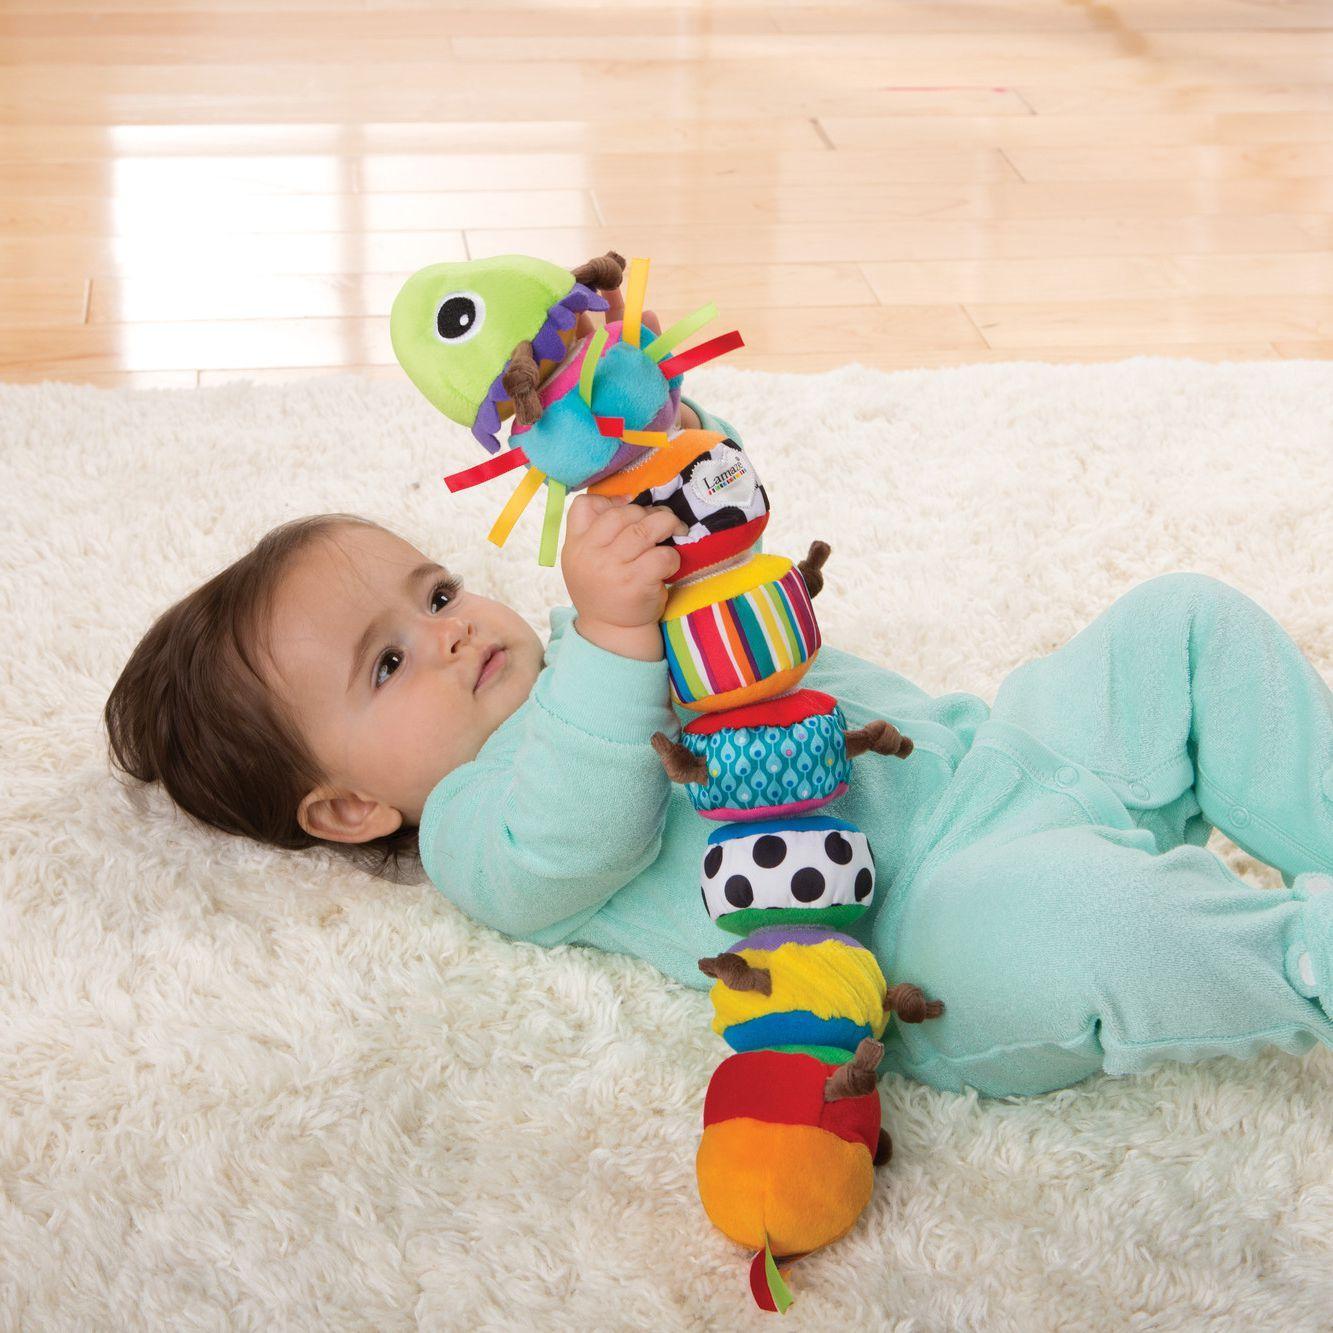 C:\Users\SUPRIYA\Downloads\Lamaze_caterpillar_baby_toy-57c05b0f5f9b5855e511e923-min.jpg